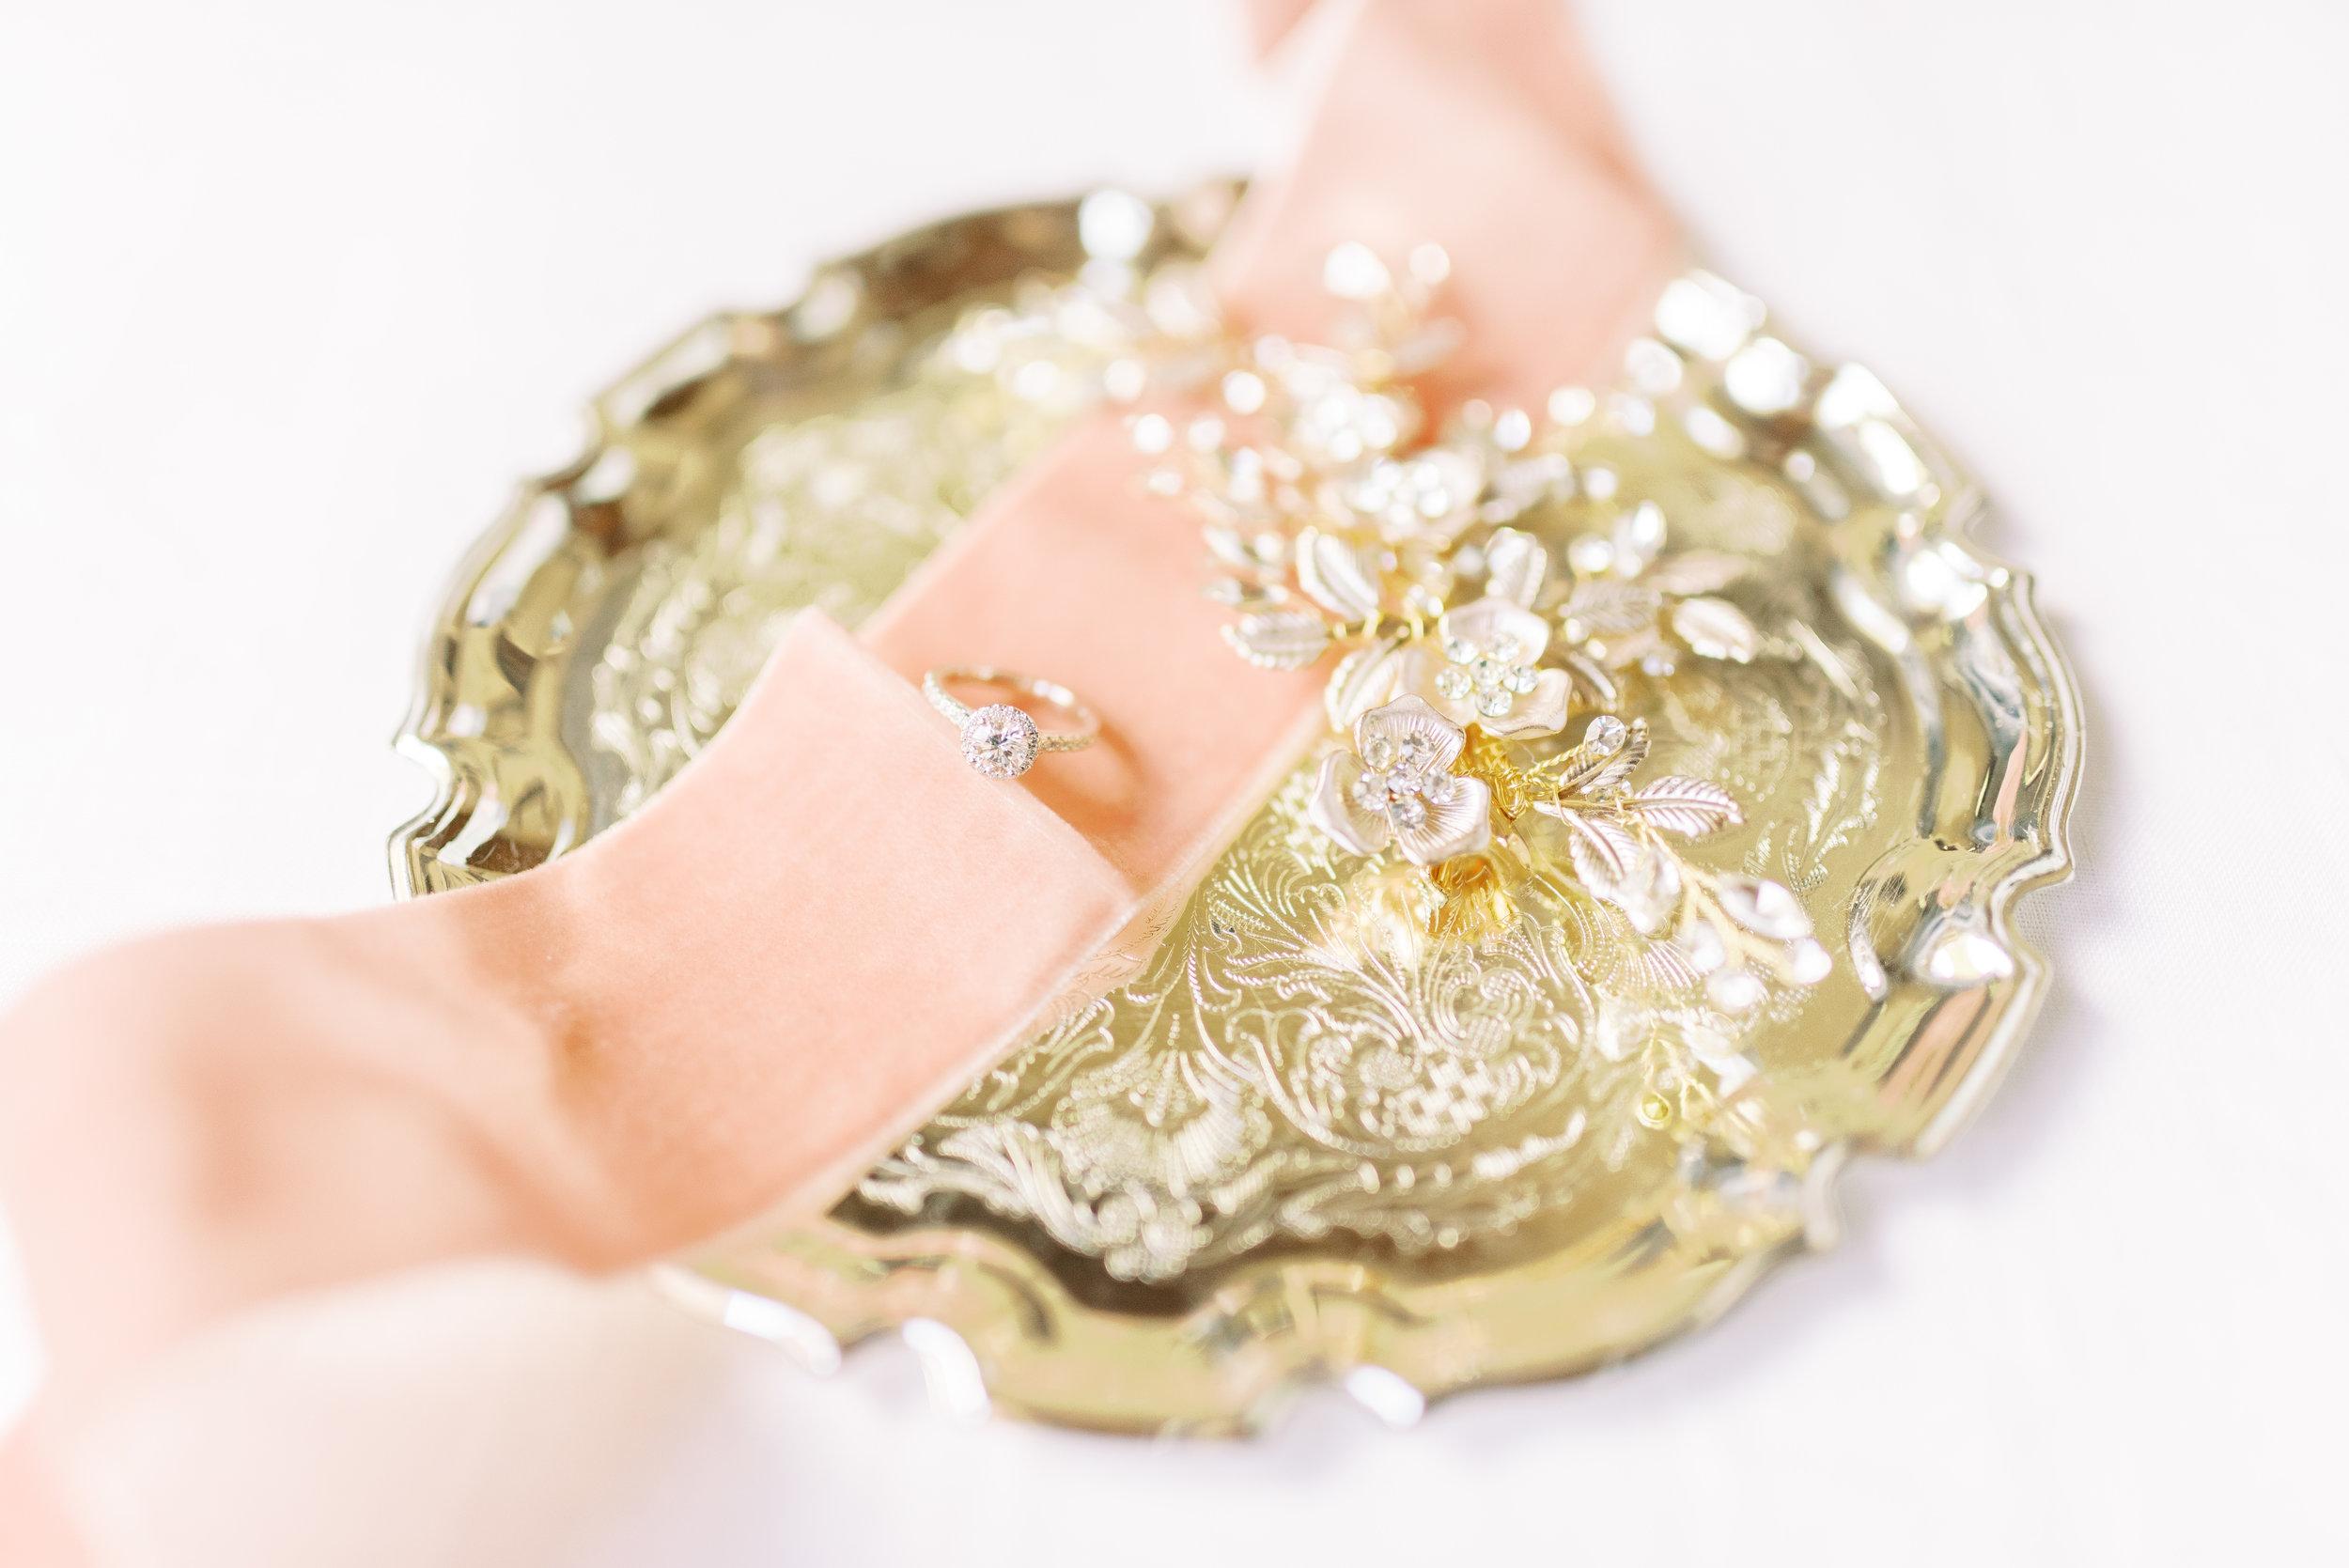 Kooroomba-Vineyard-Lavender-Farm-Wedding-Fine-Art-Lauren-Olivia-2.jpg